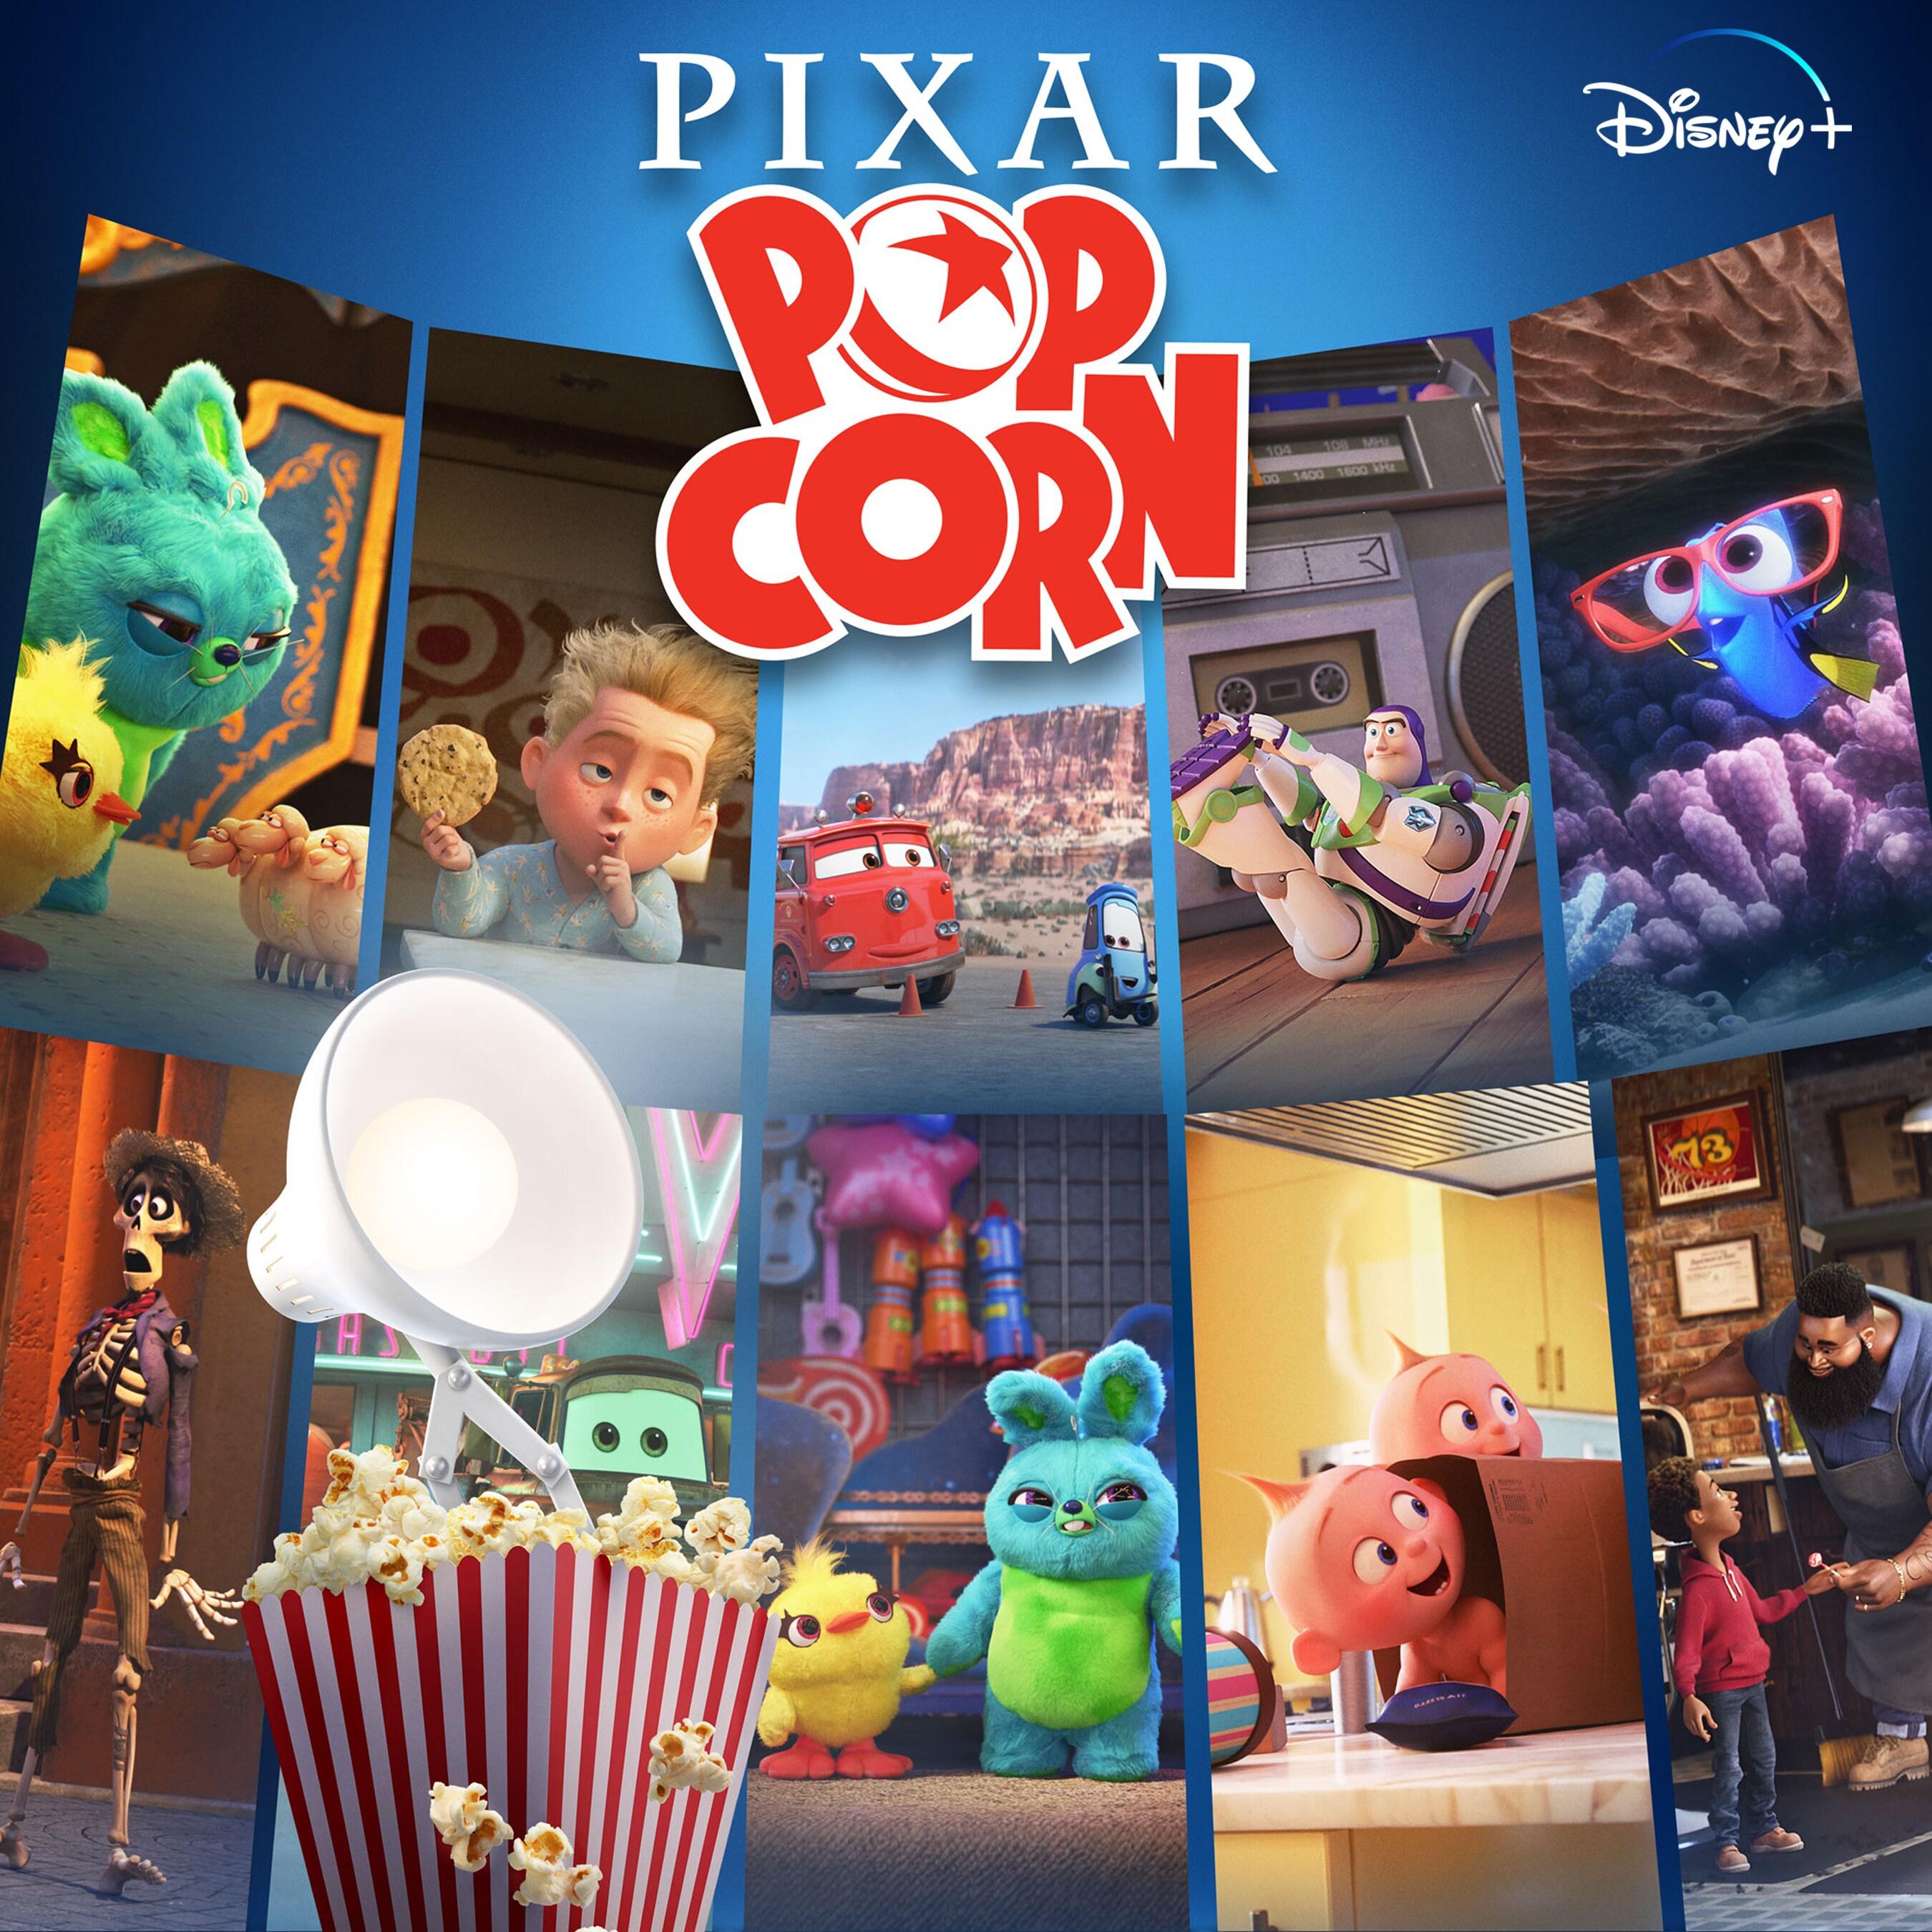 Pixar Pop Corn